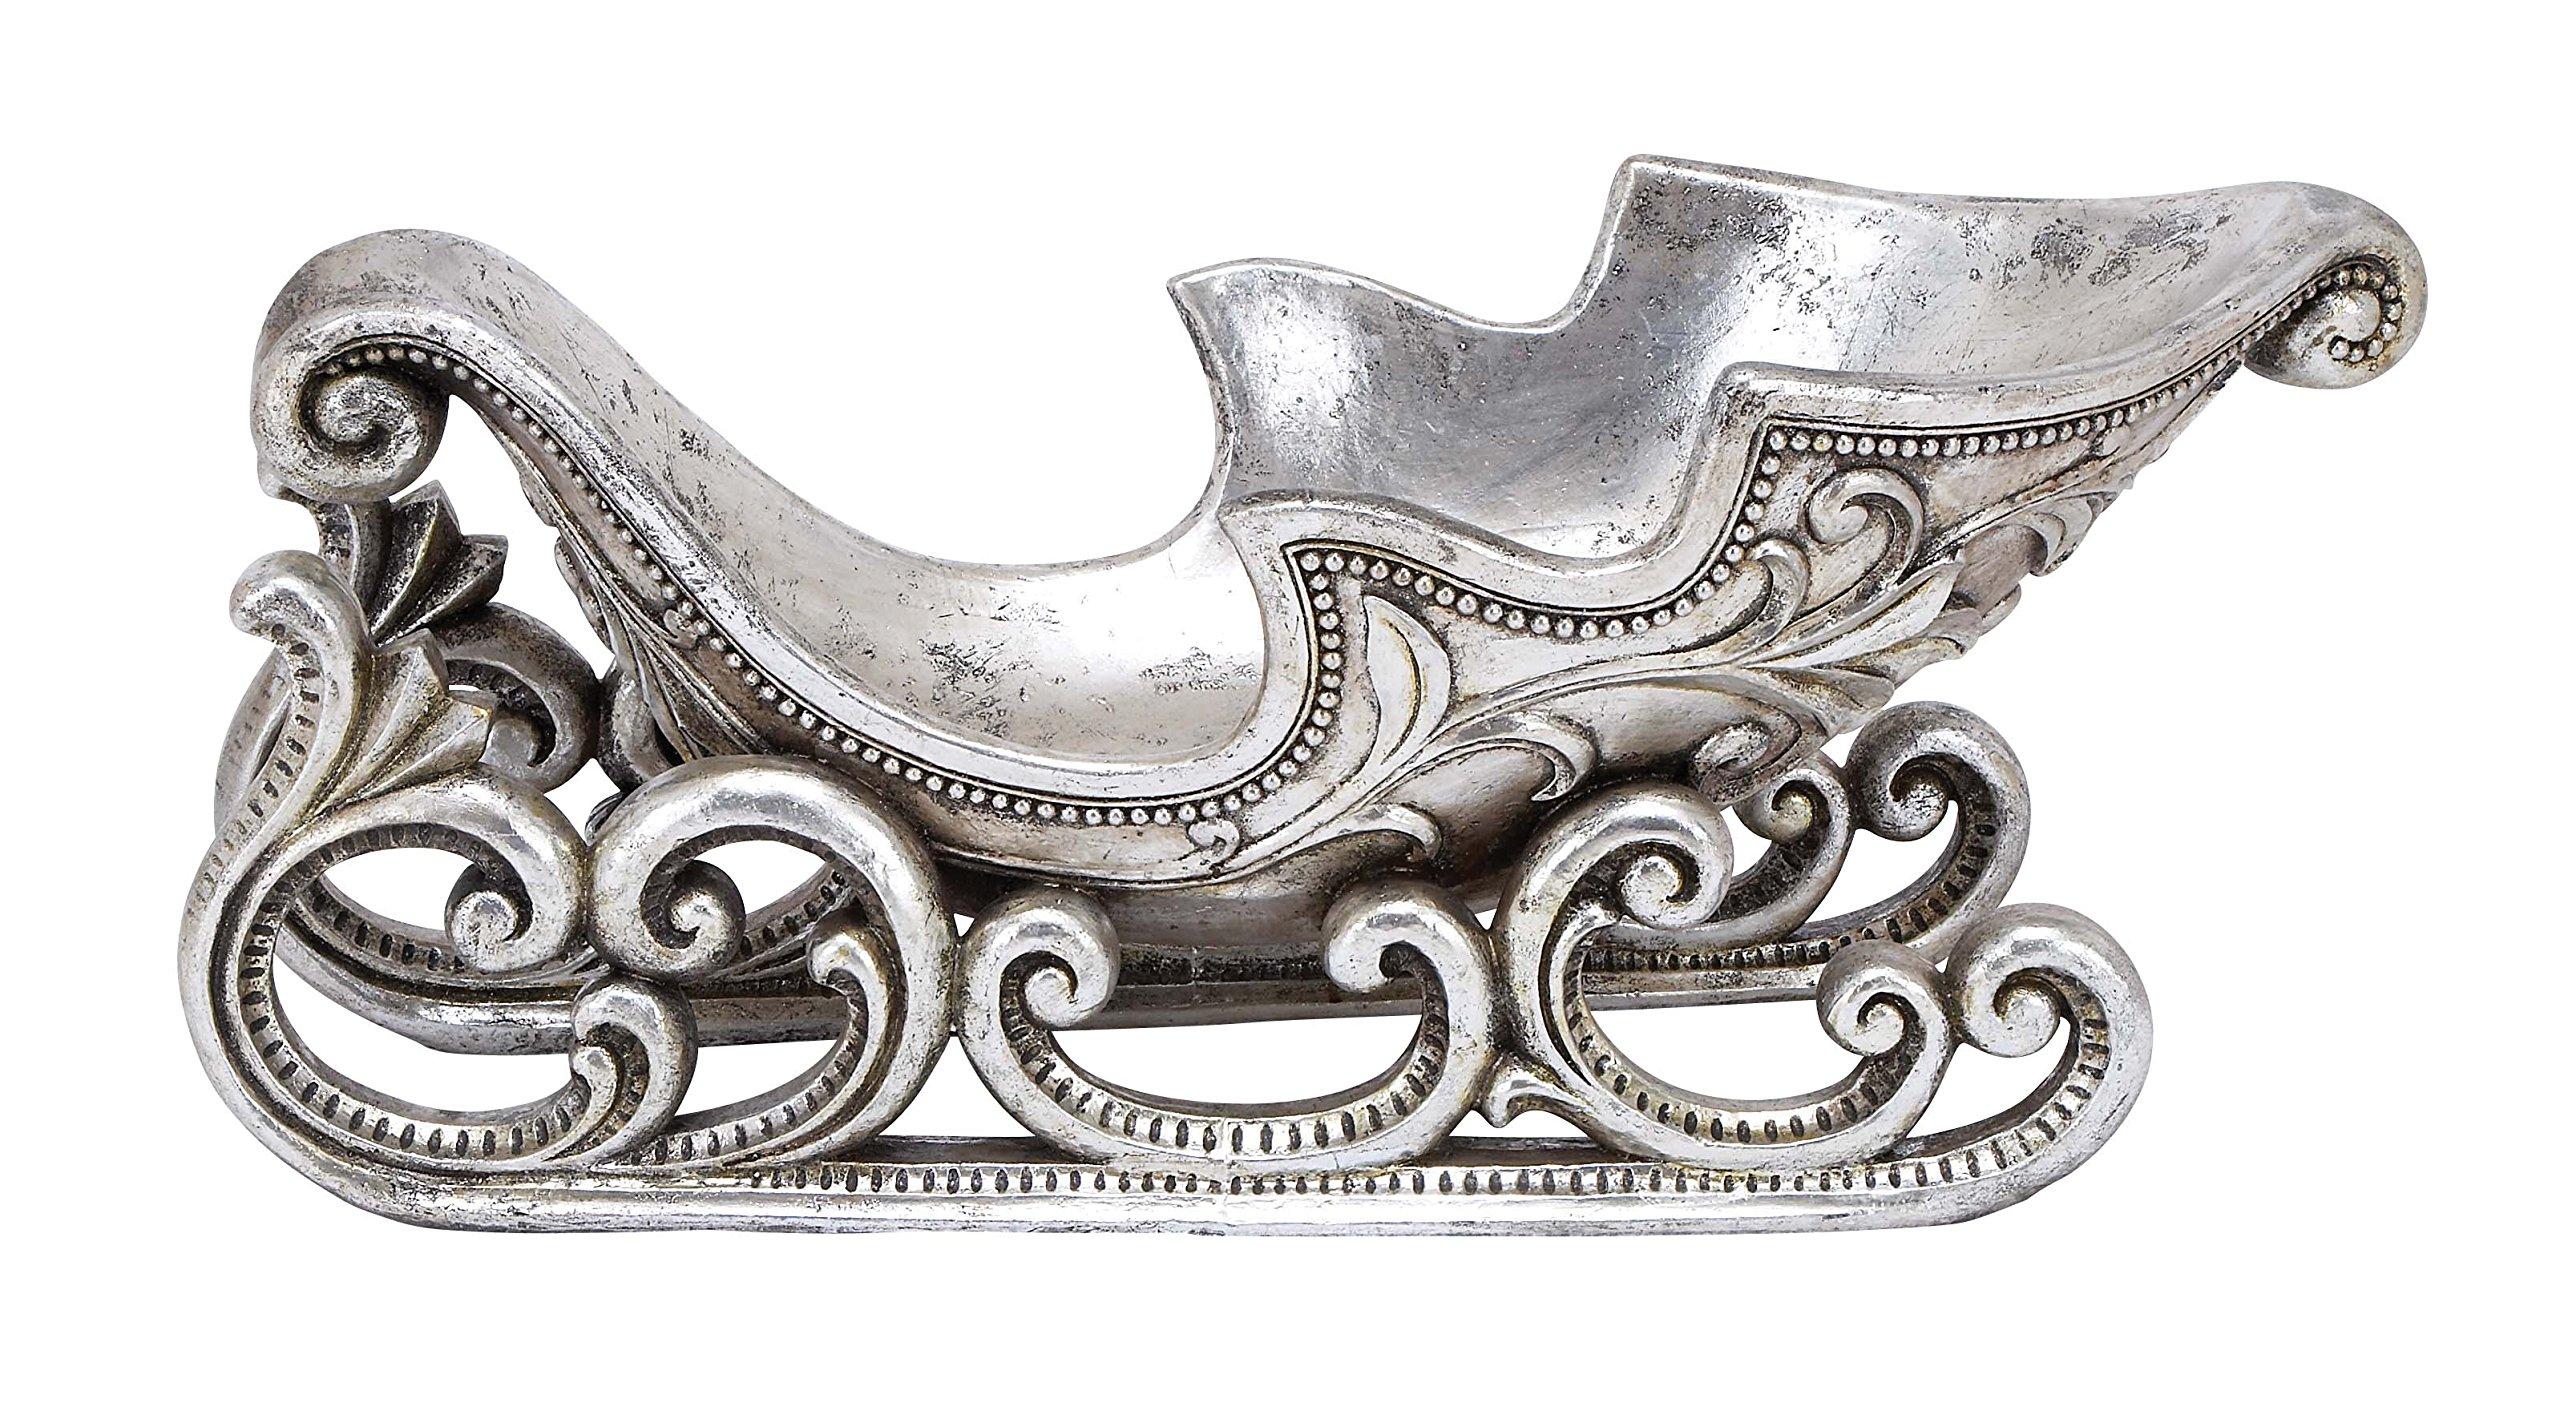 Plutus Brands Awestruck Xmas Sled, Silver Finish